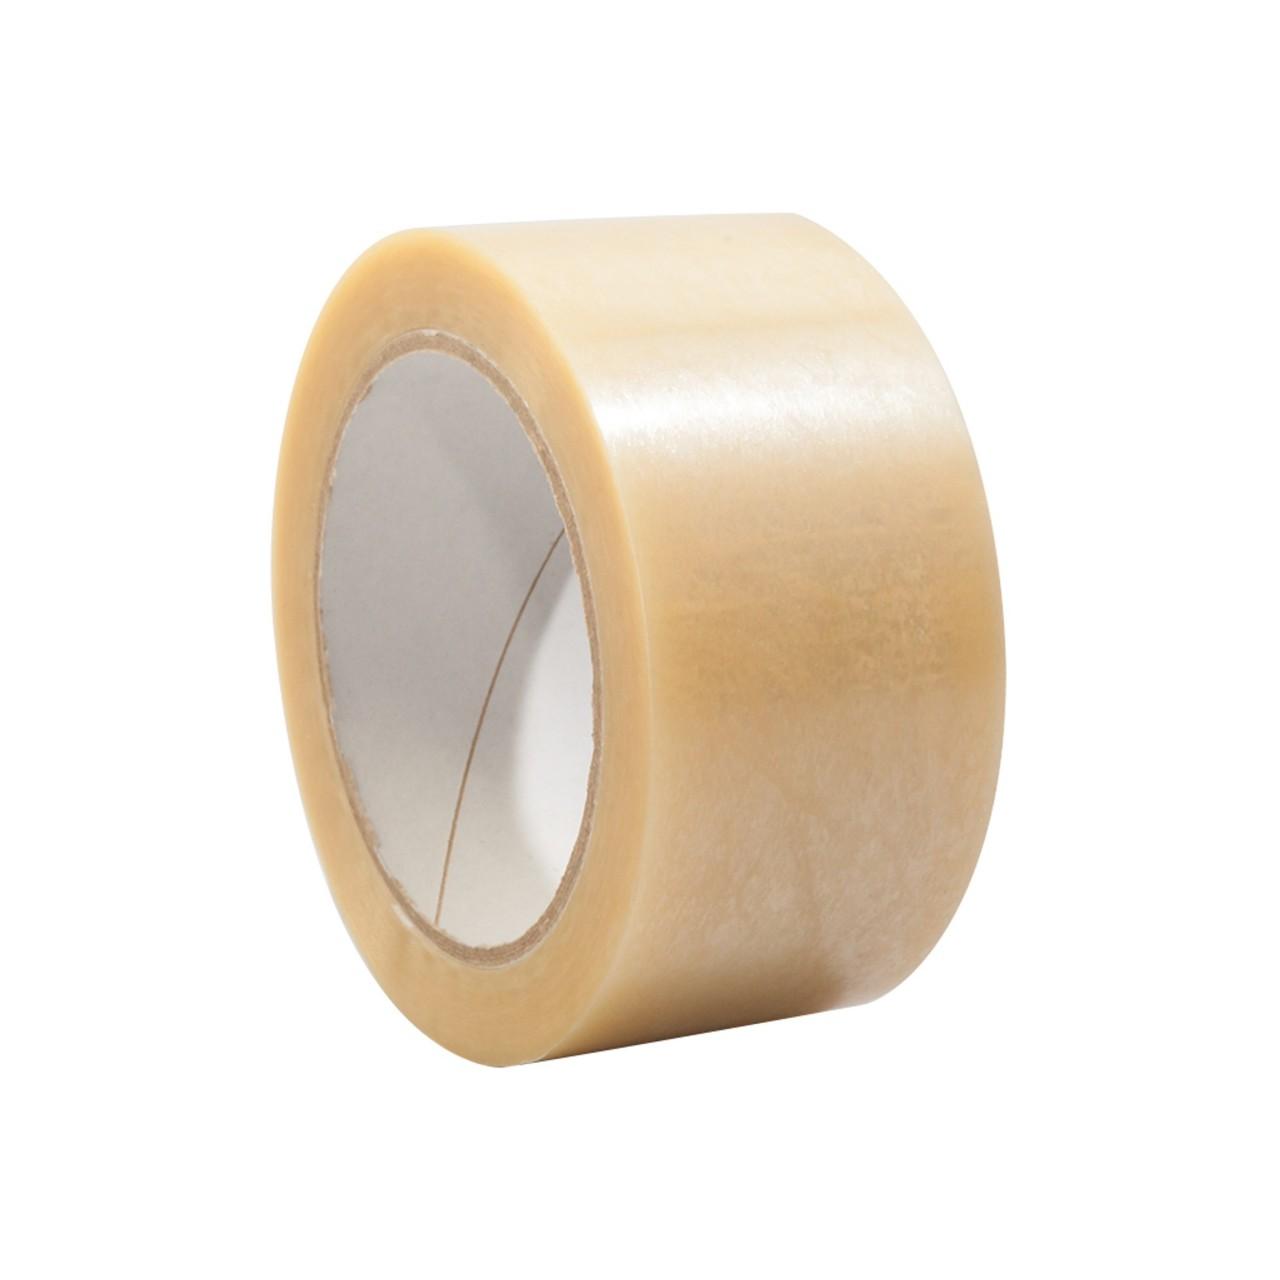 müroll 100, PVC-Verpackungsklebeband, 50mm x 66m